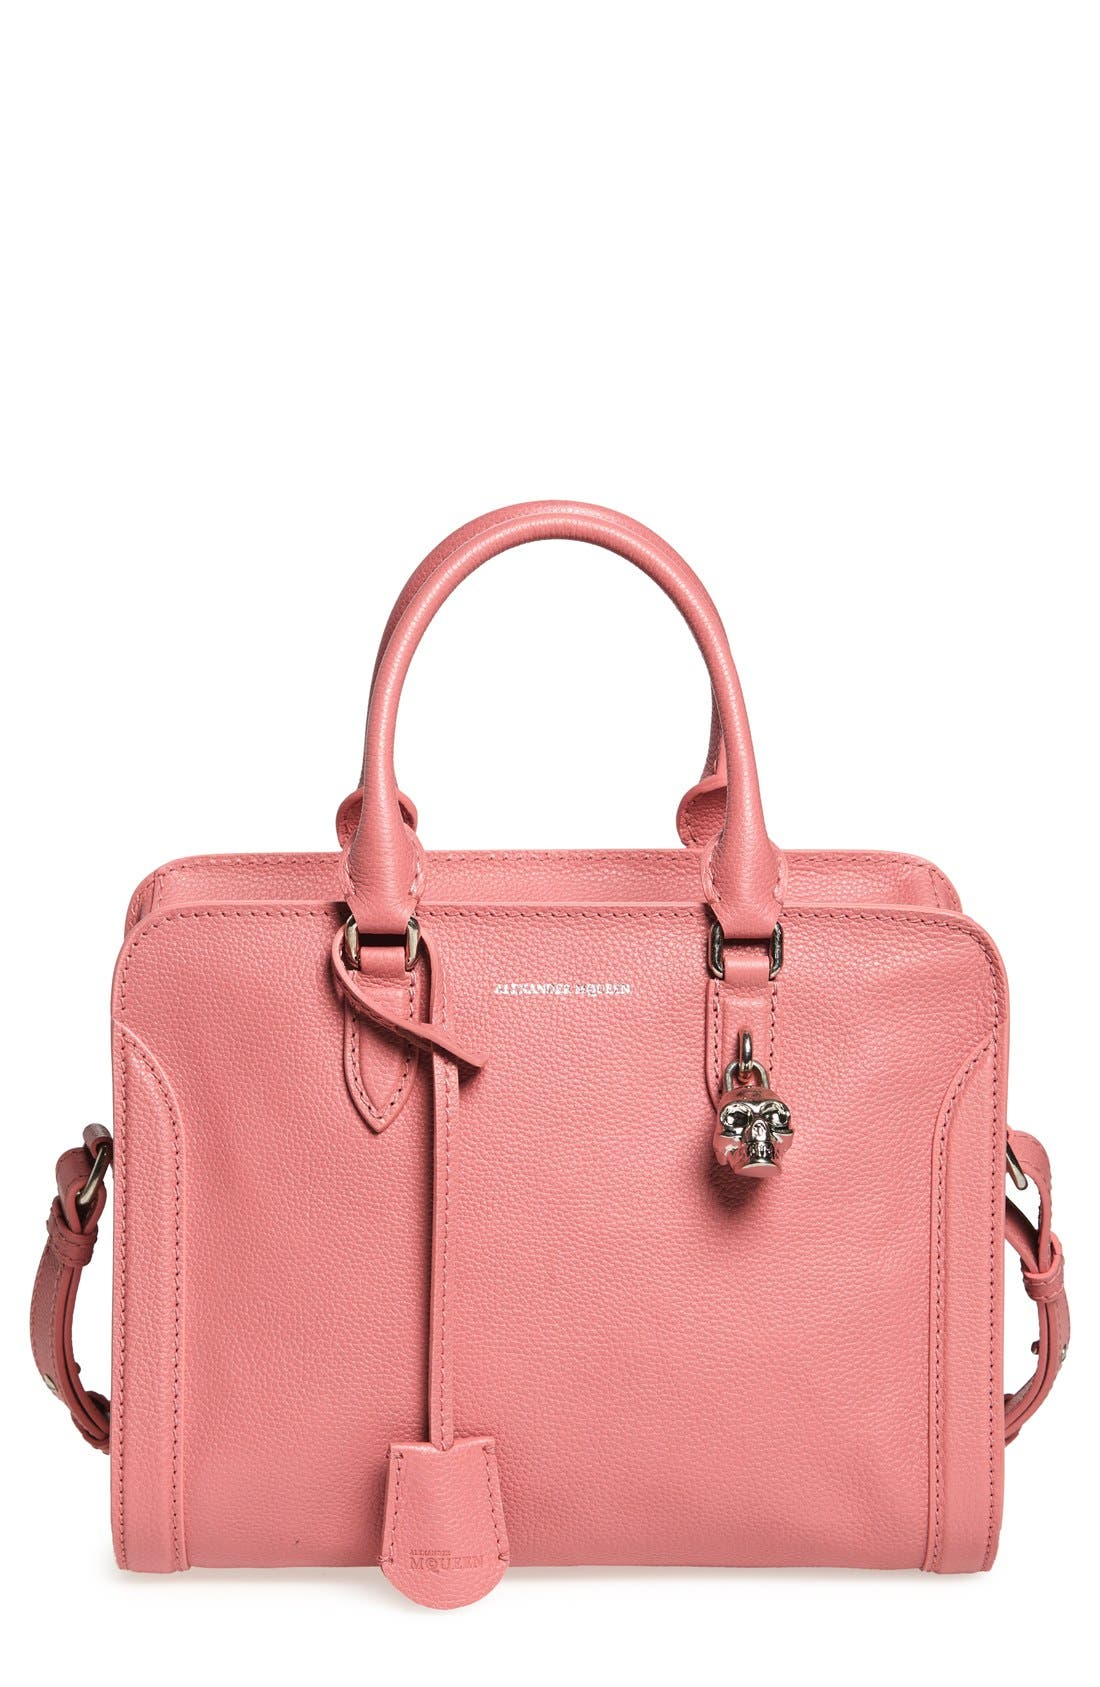 Alternate Image 1 Selected - Alexander McQueen 'Small Padlock' Leather Duffel Bag